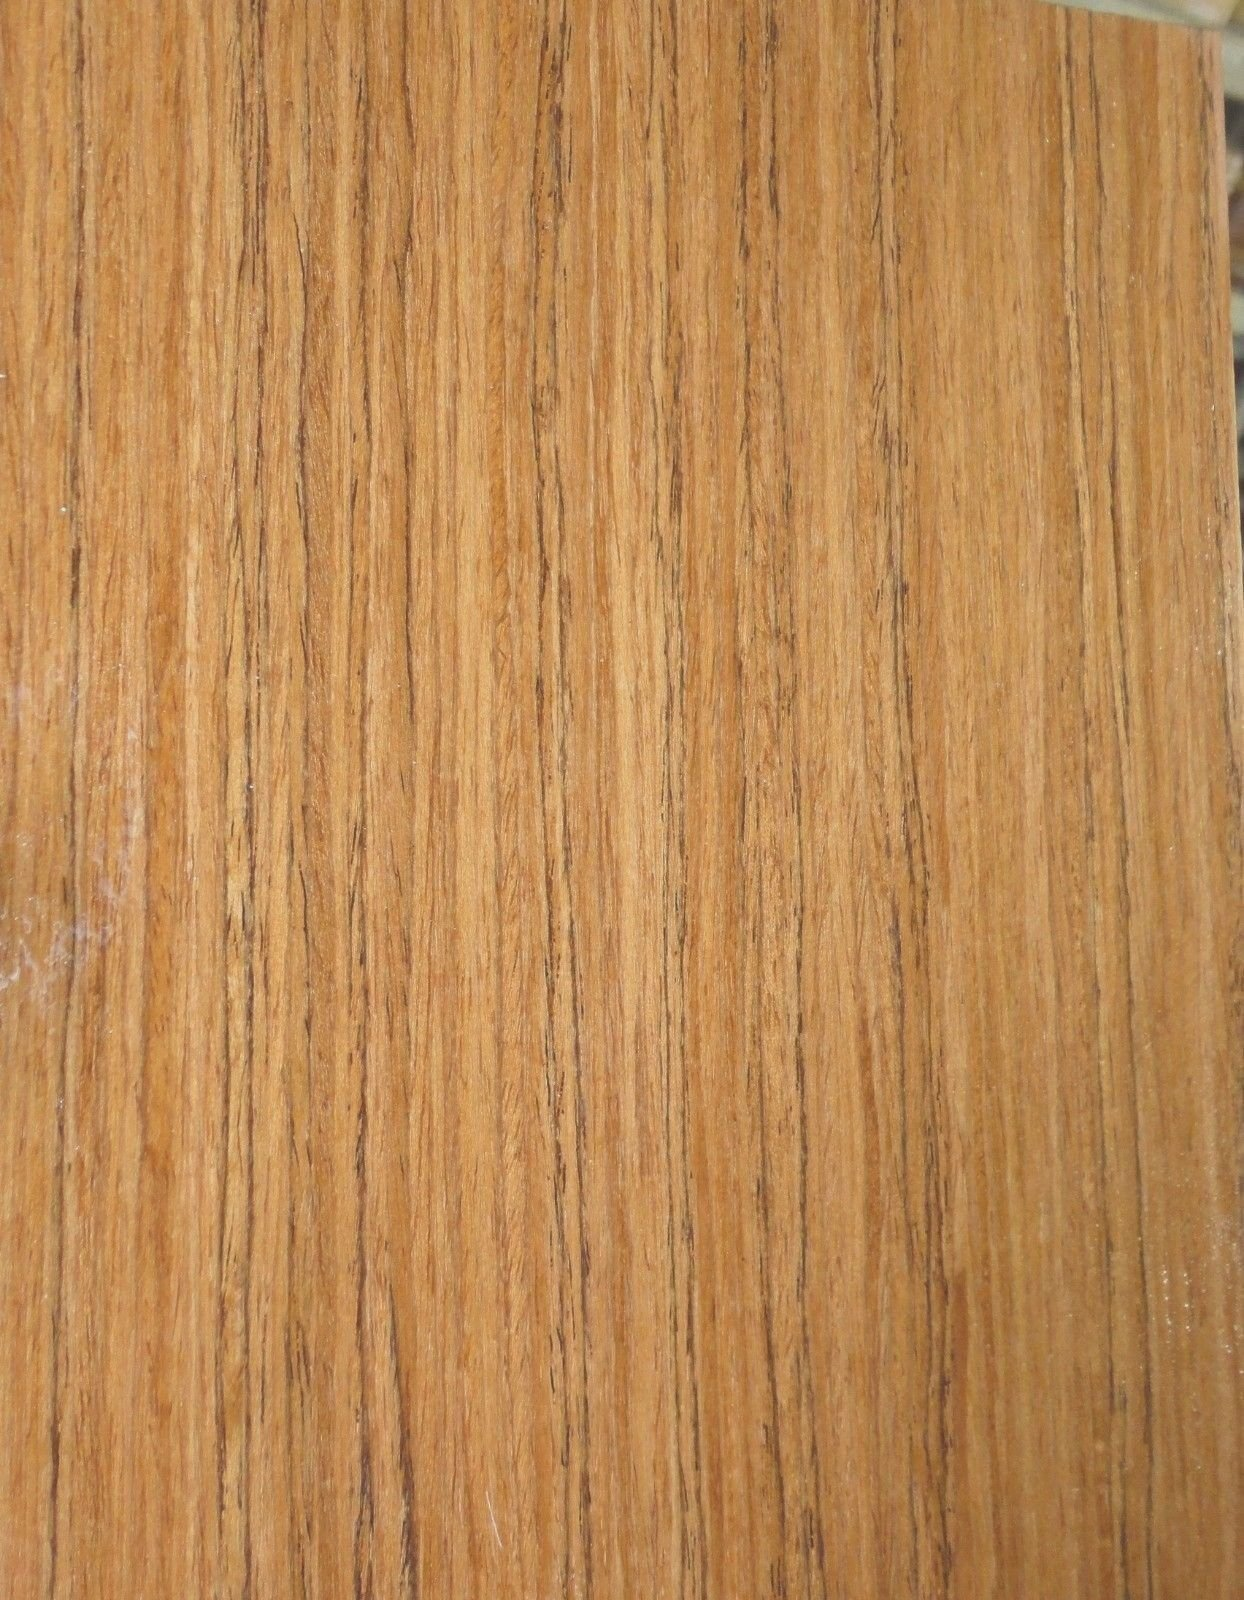 Teak African composite wood veneer 48'' x 96'' on paper backer 1/40th'' thick (EFW)